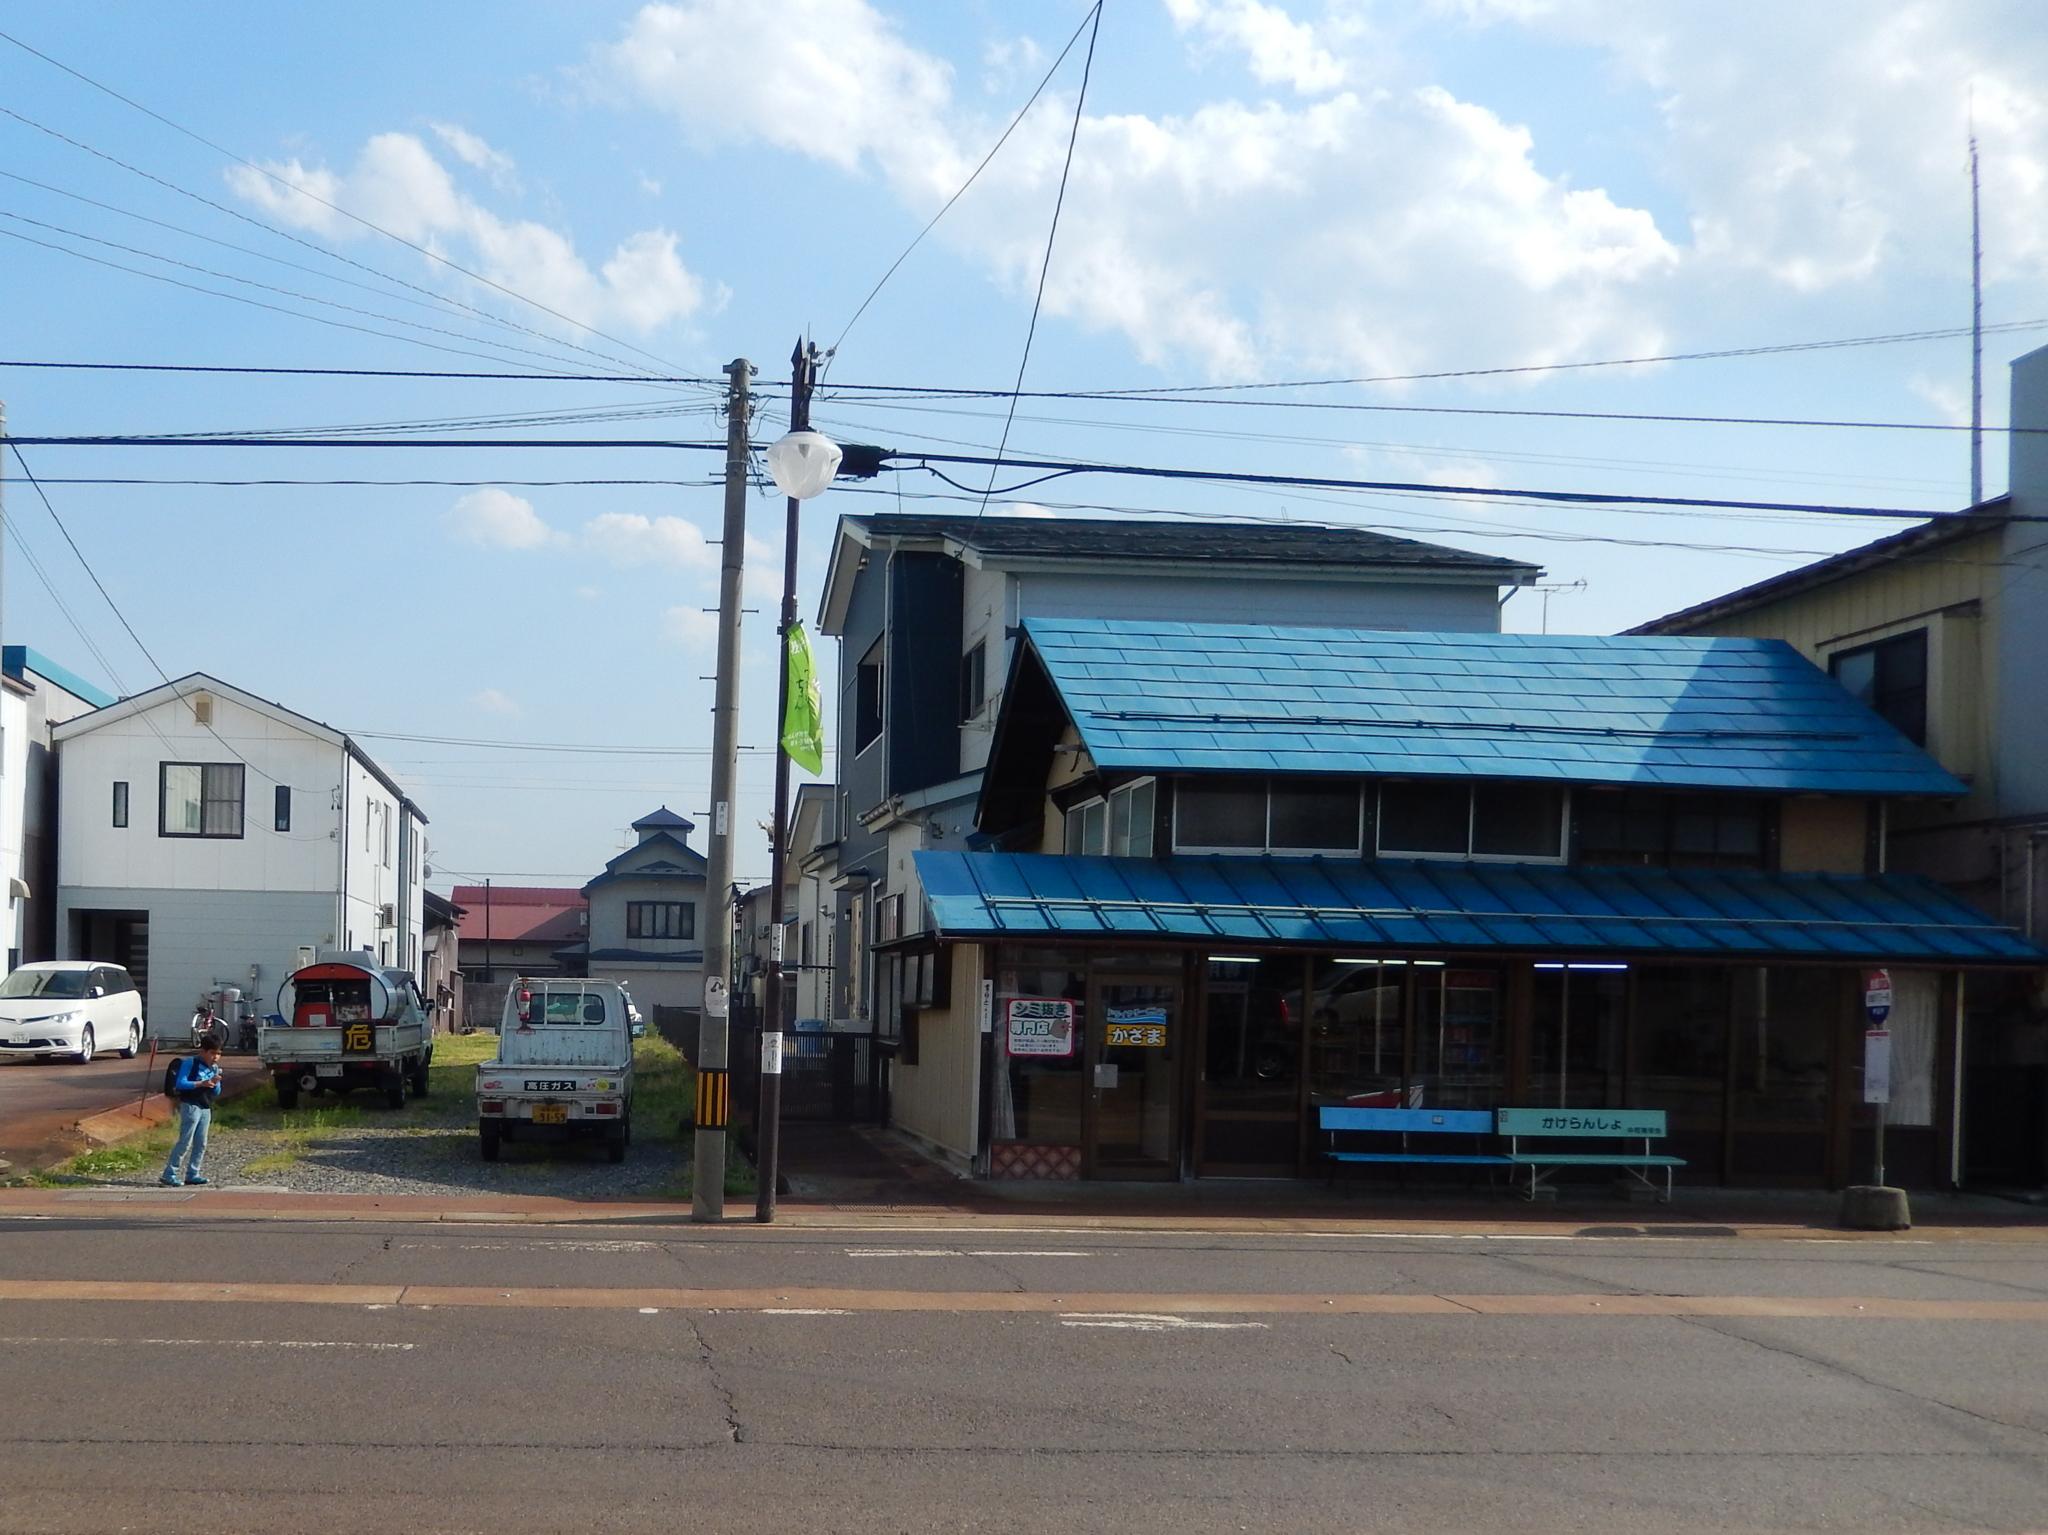 f:id:ToshUeno:20150513152455j:plain